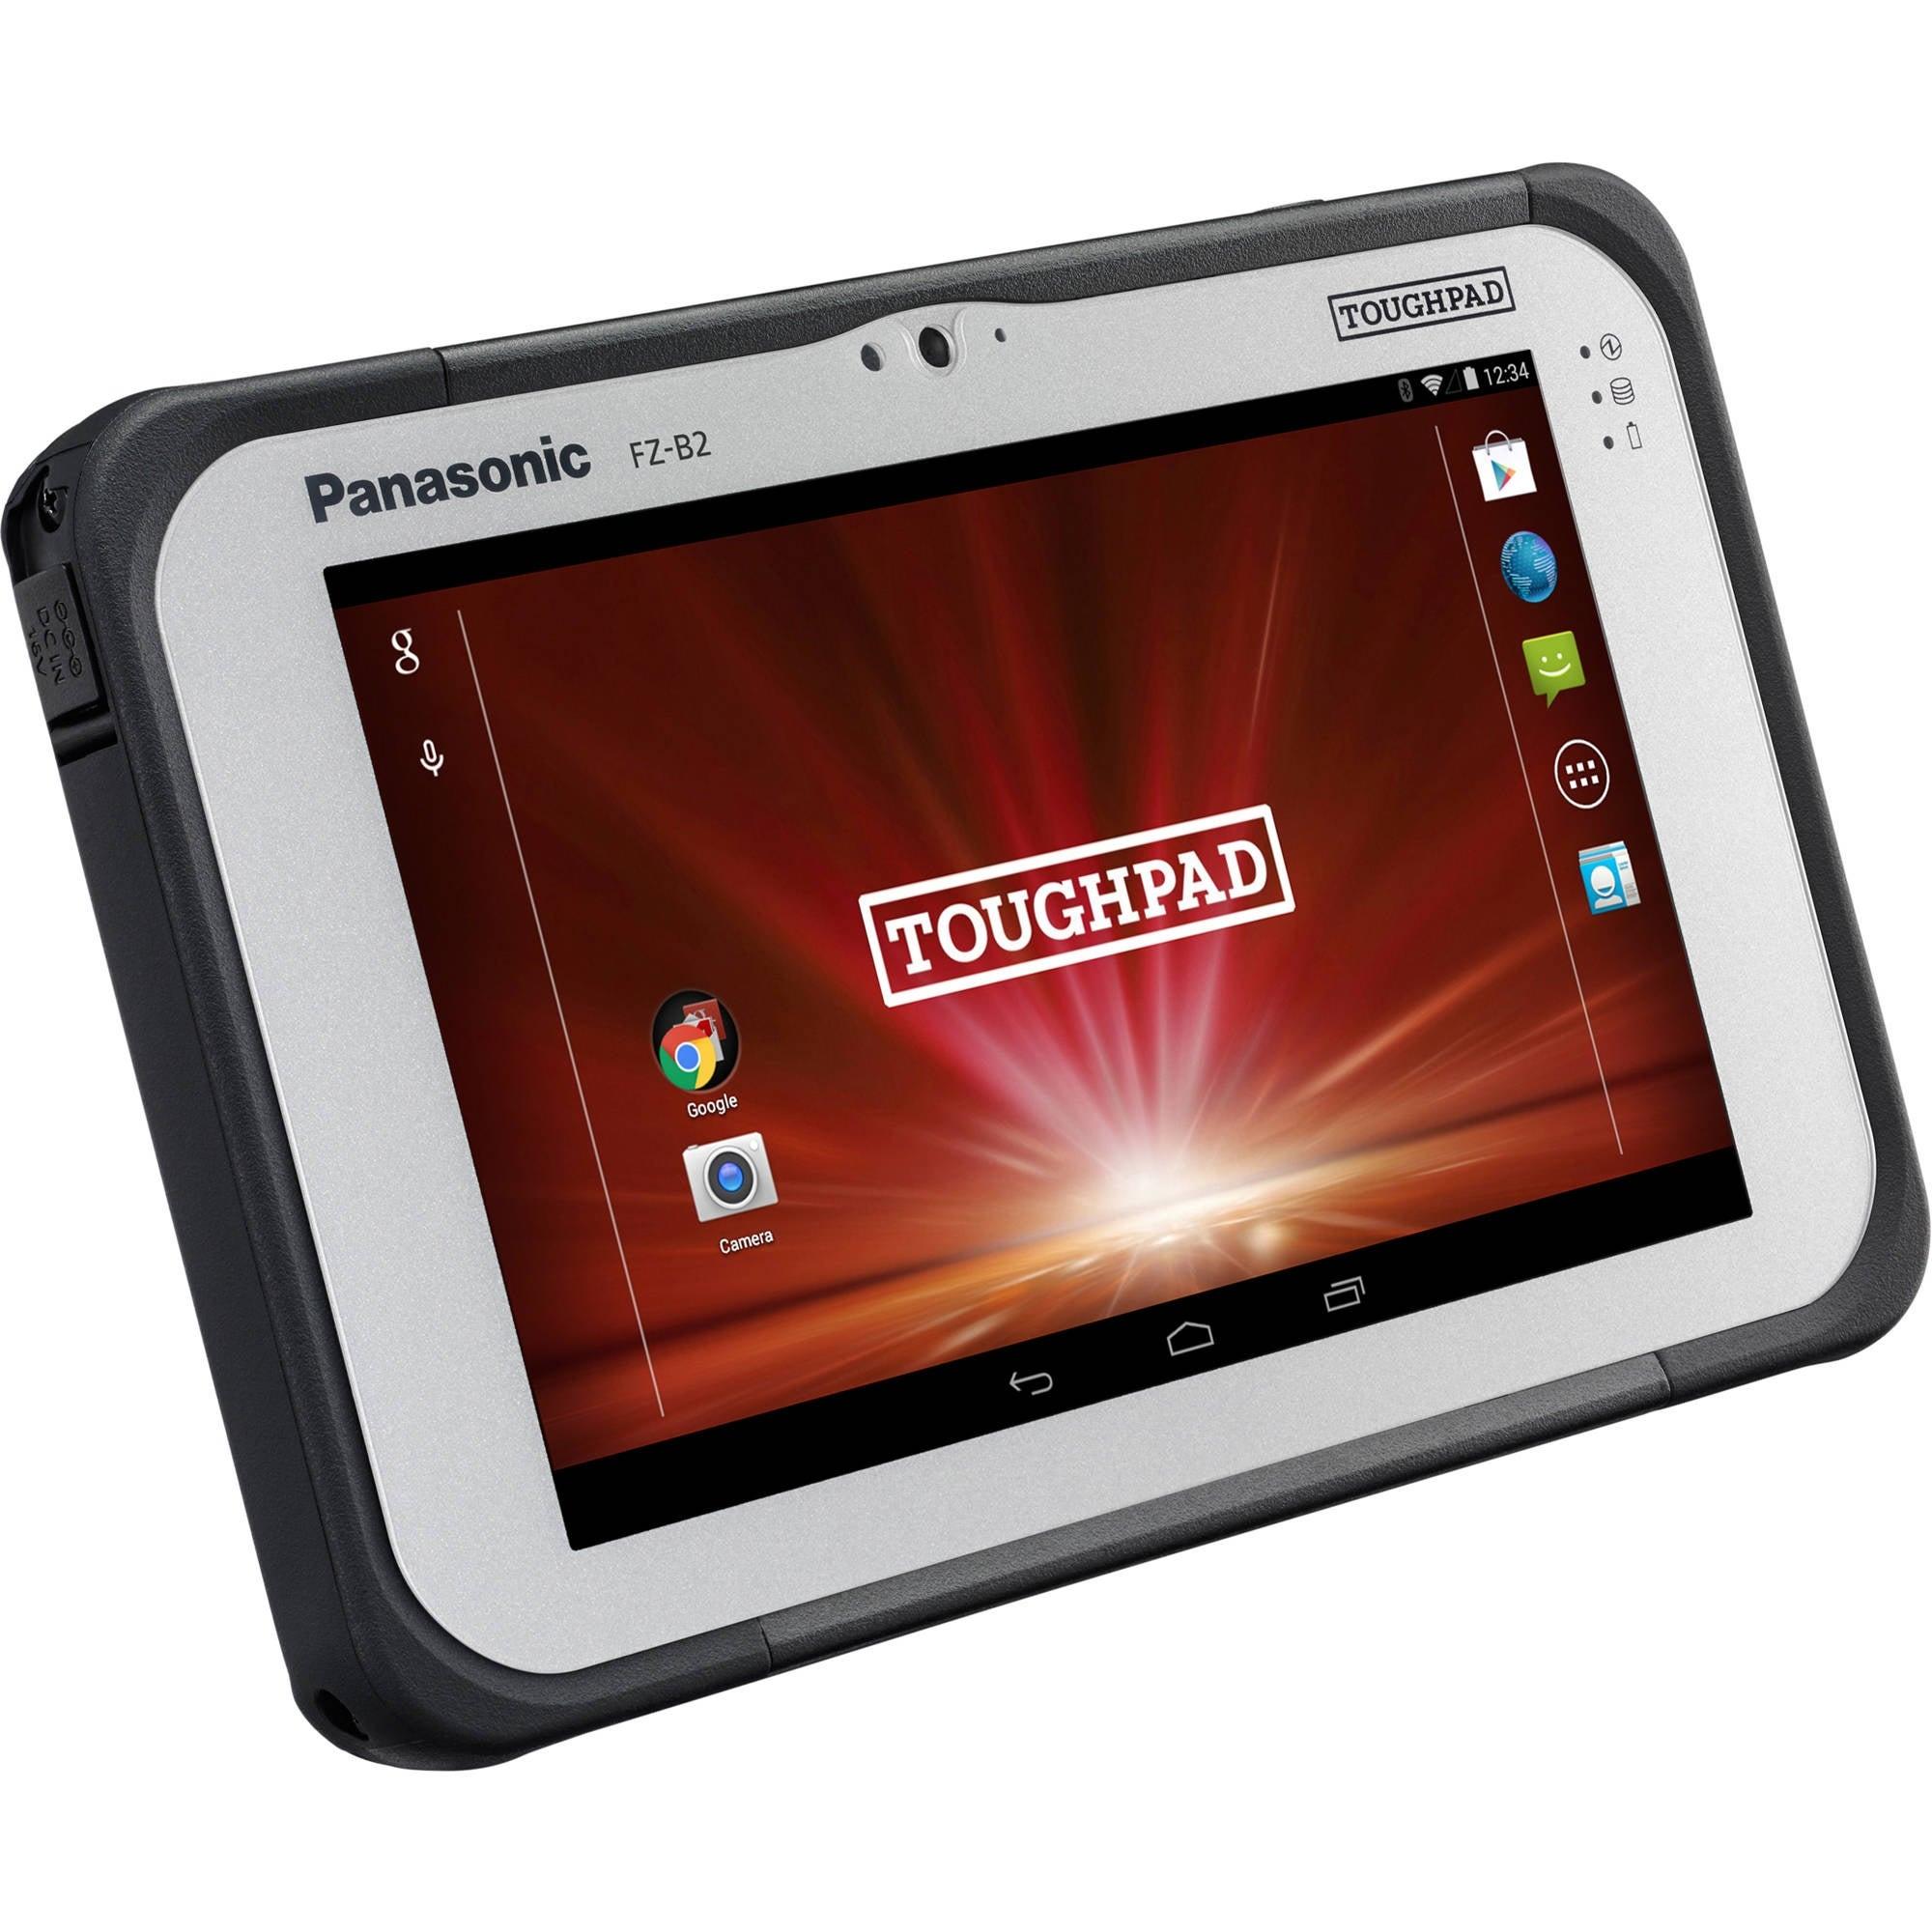 Panasonic Toughpad FZB2 7 inch Tablet